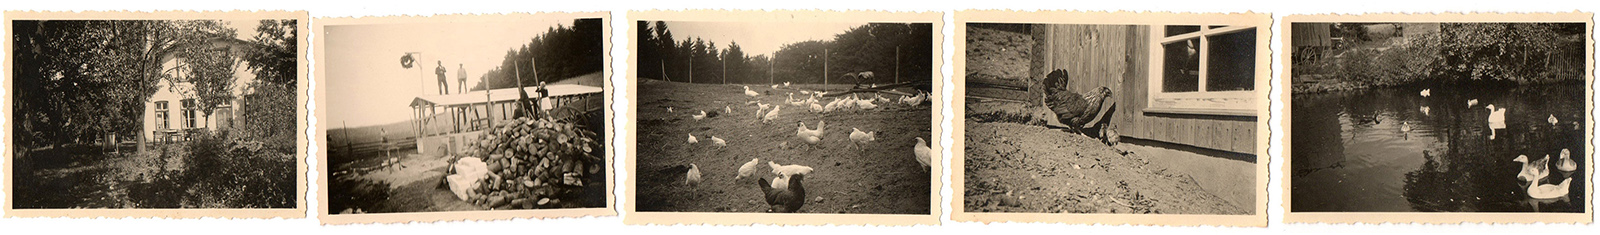 Hornbrooker Hof in den 30er Jahren